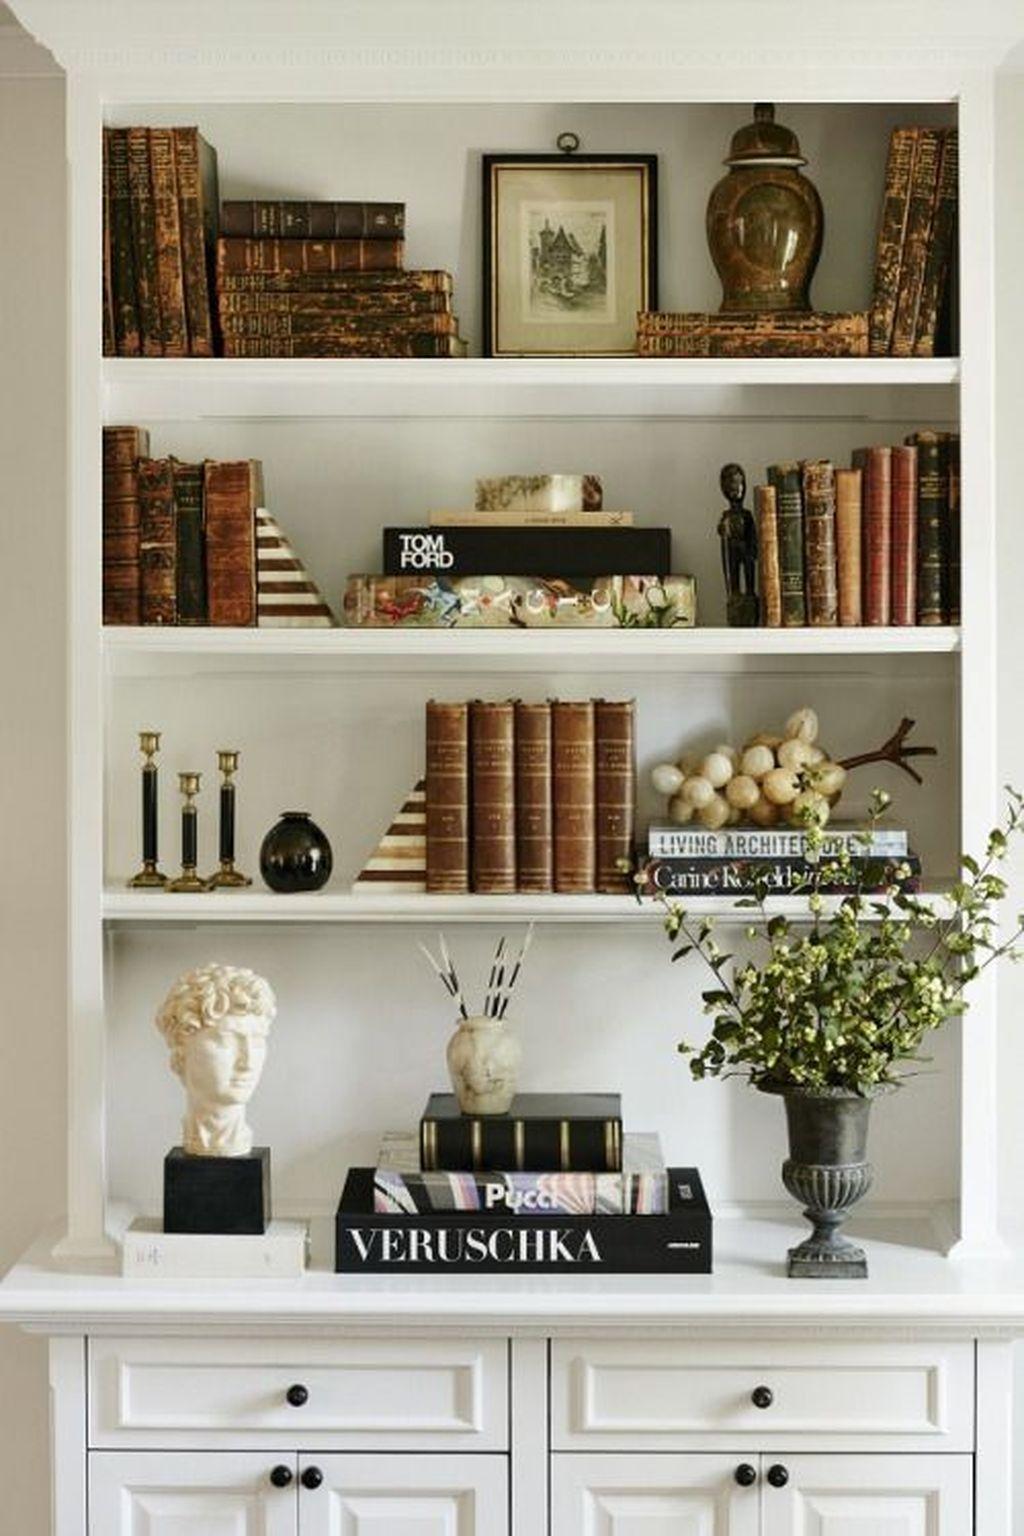 Living Room Bookshelf Ideas: 46 Amazing Bookshelves Decorating Ideas For Living Room